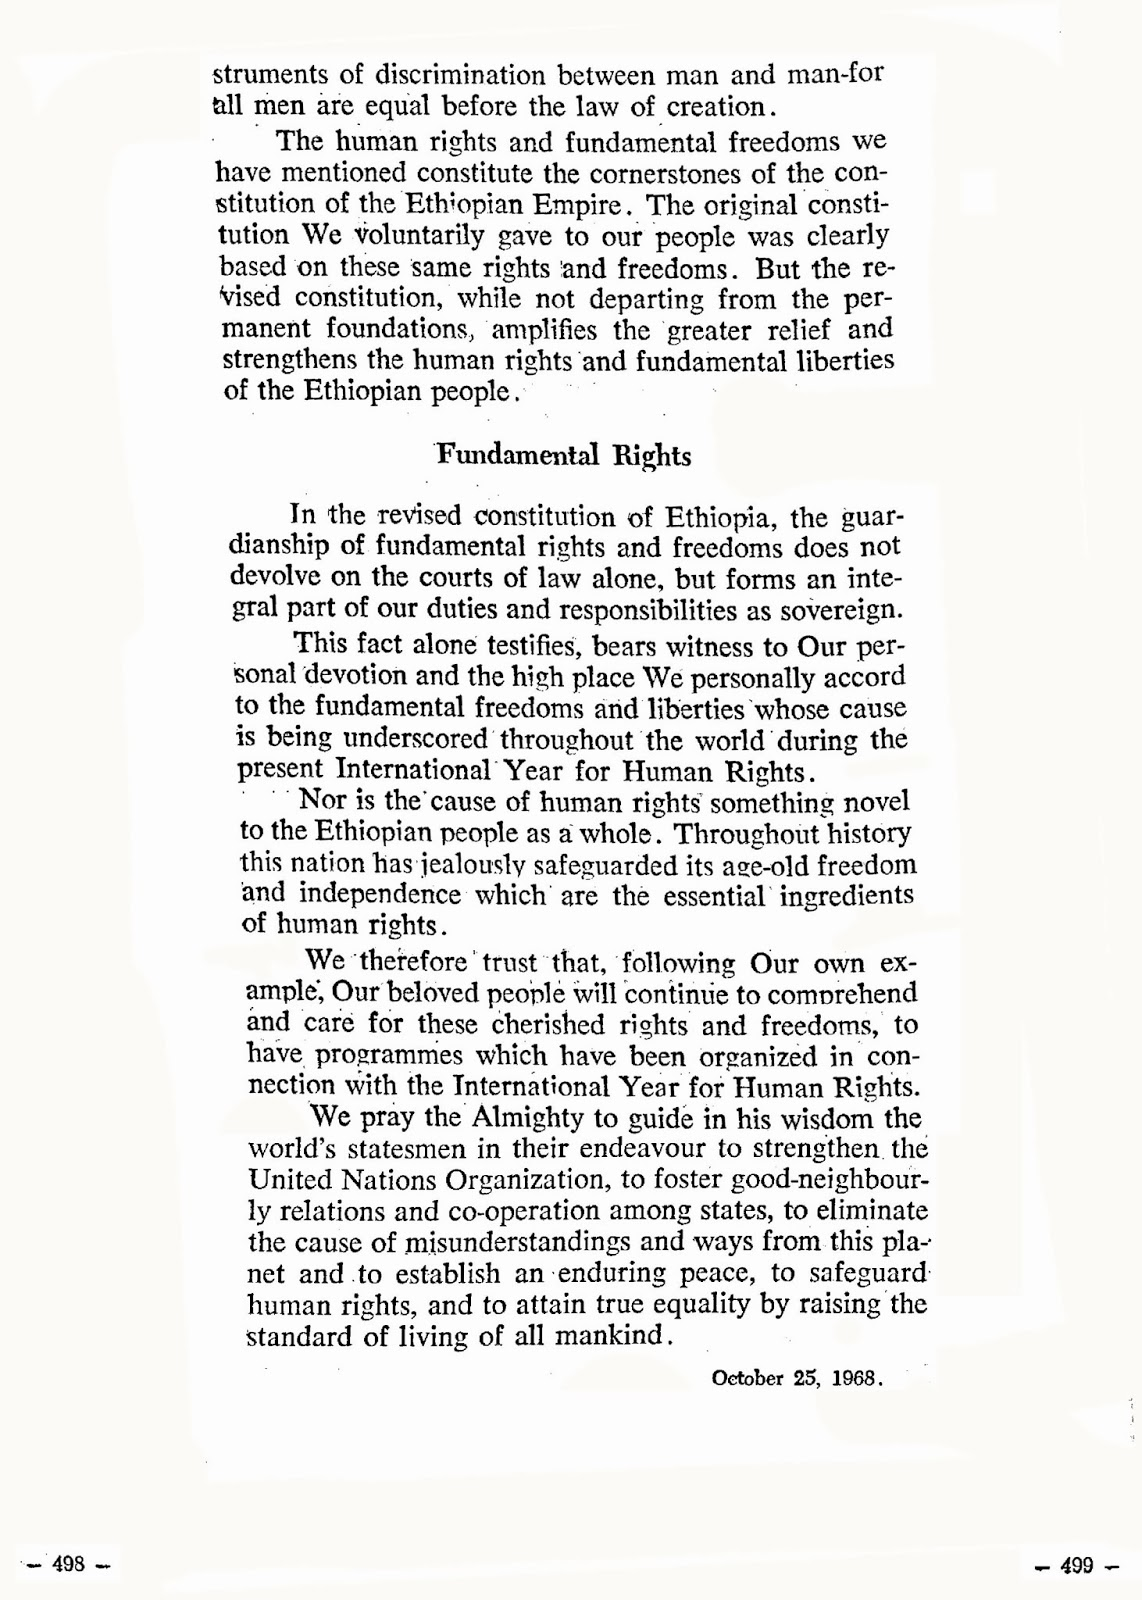 speech over fundamental rights